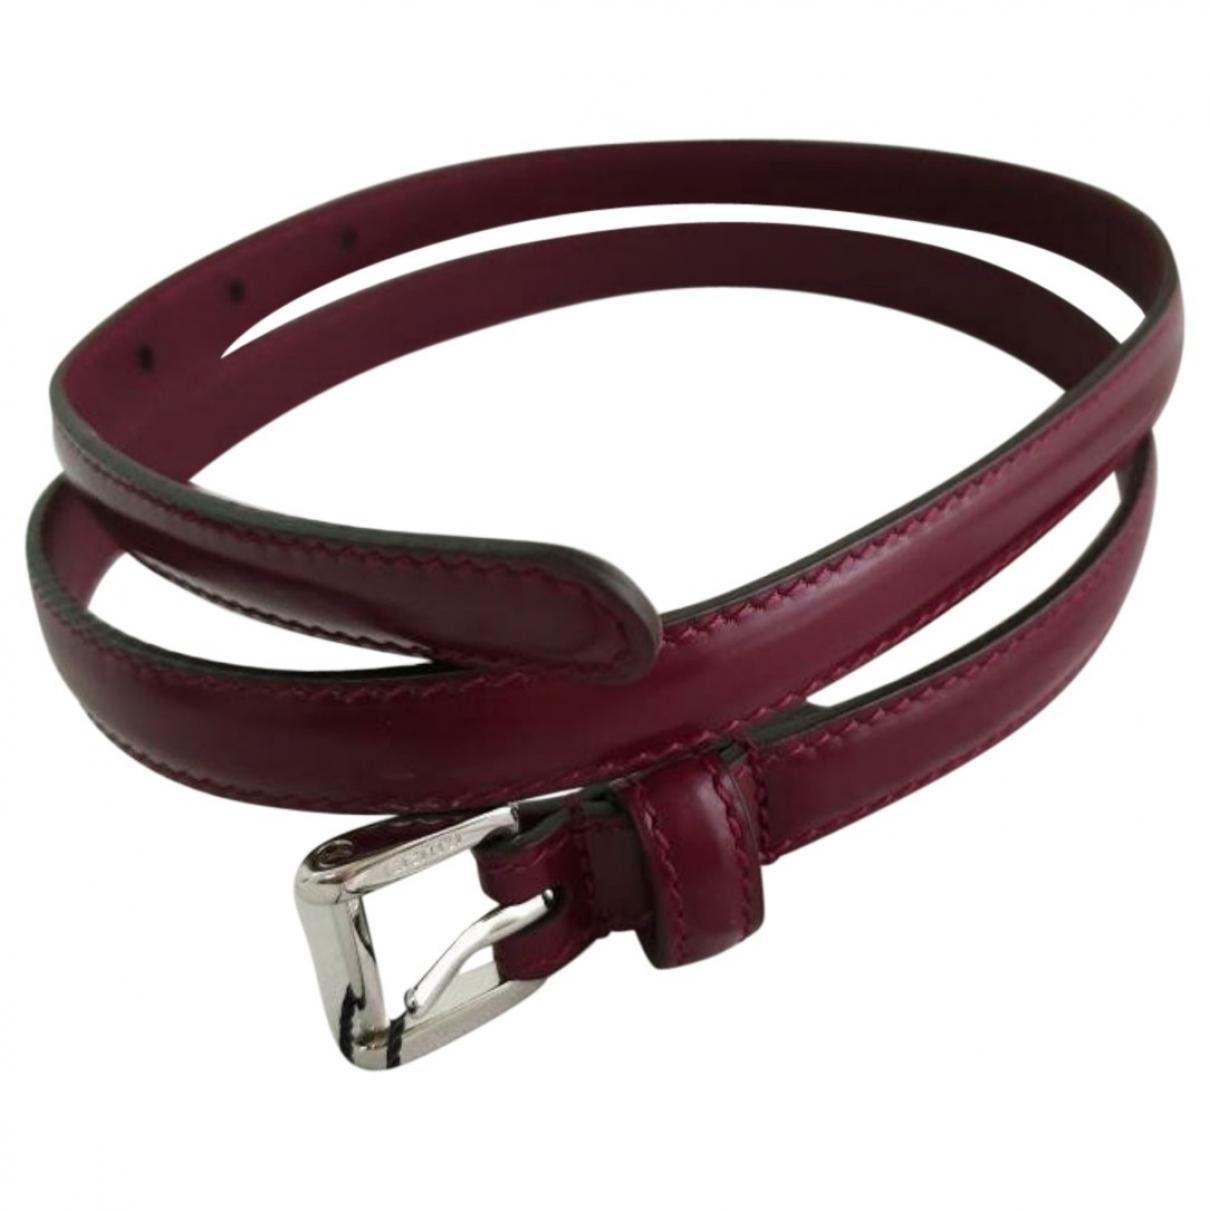 Gucci \N Burgundy Leather belt for Women 80 cm